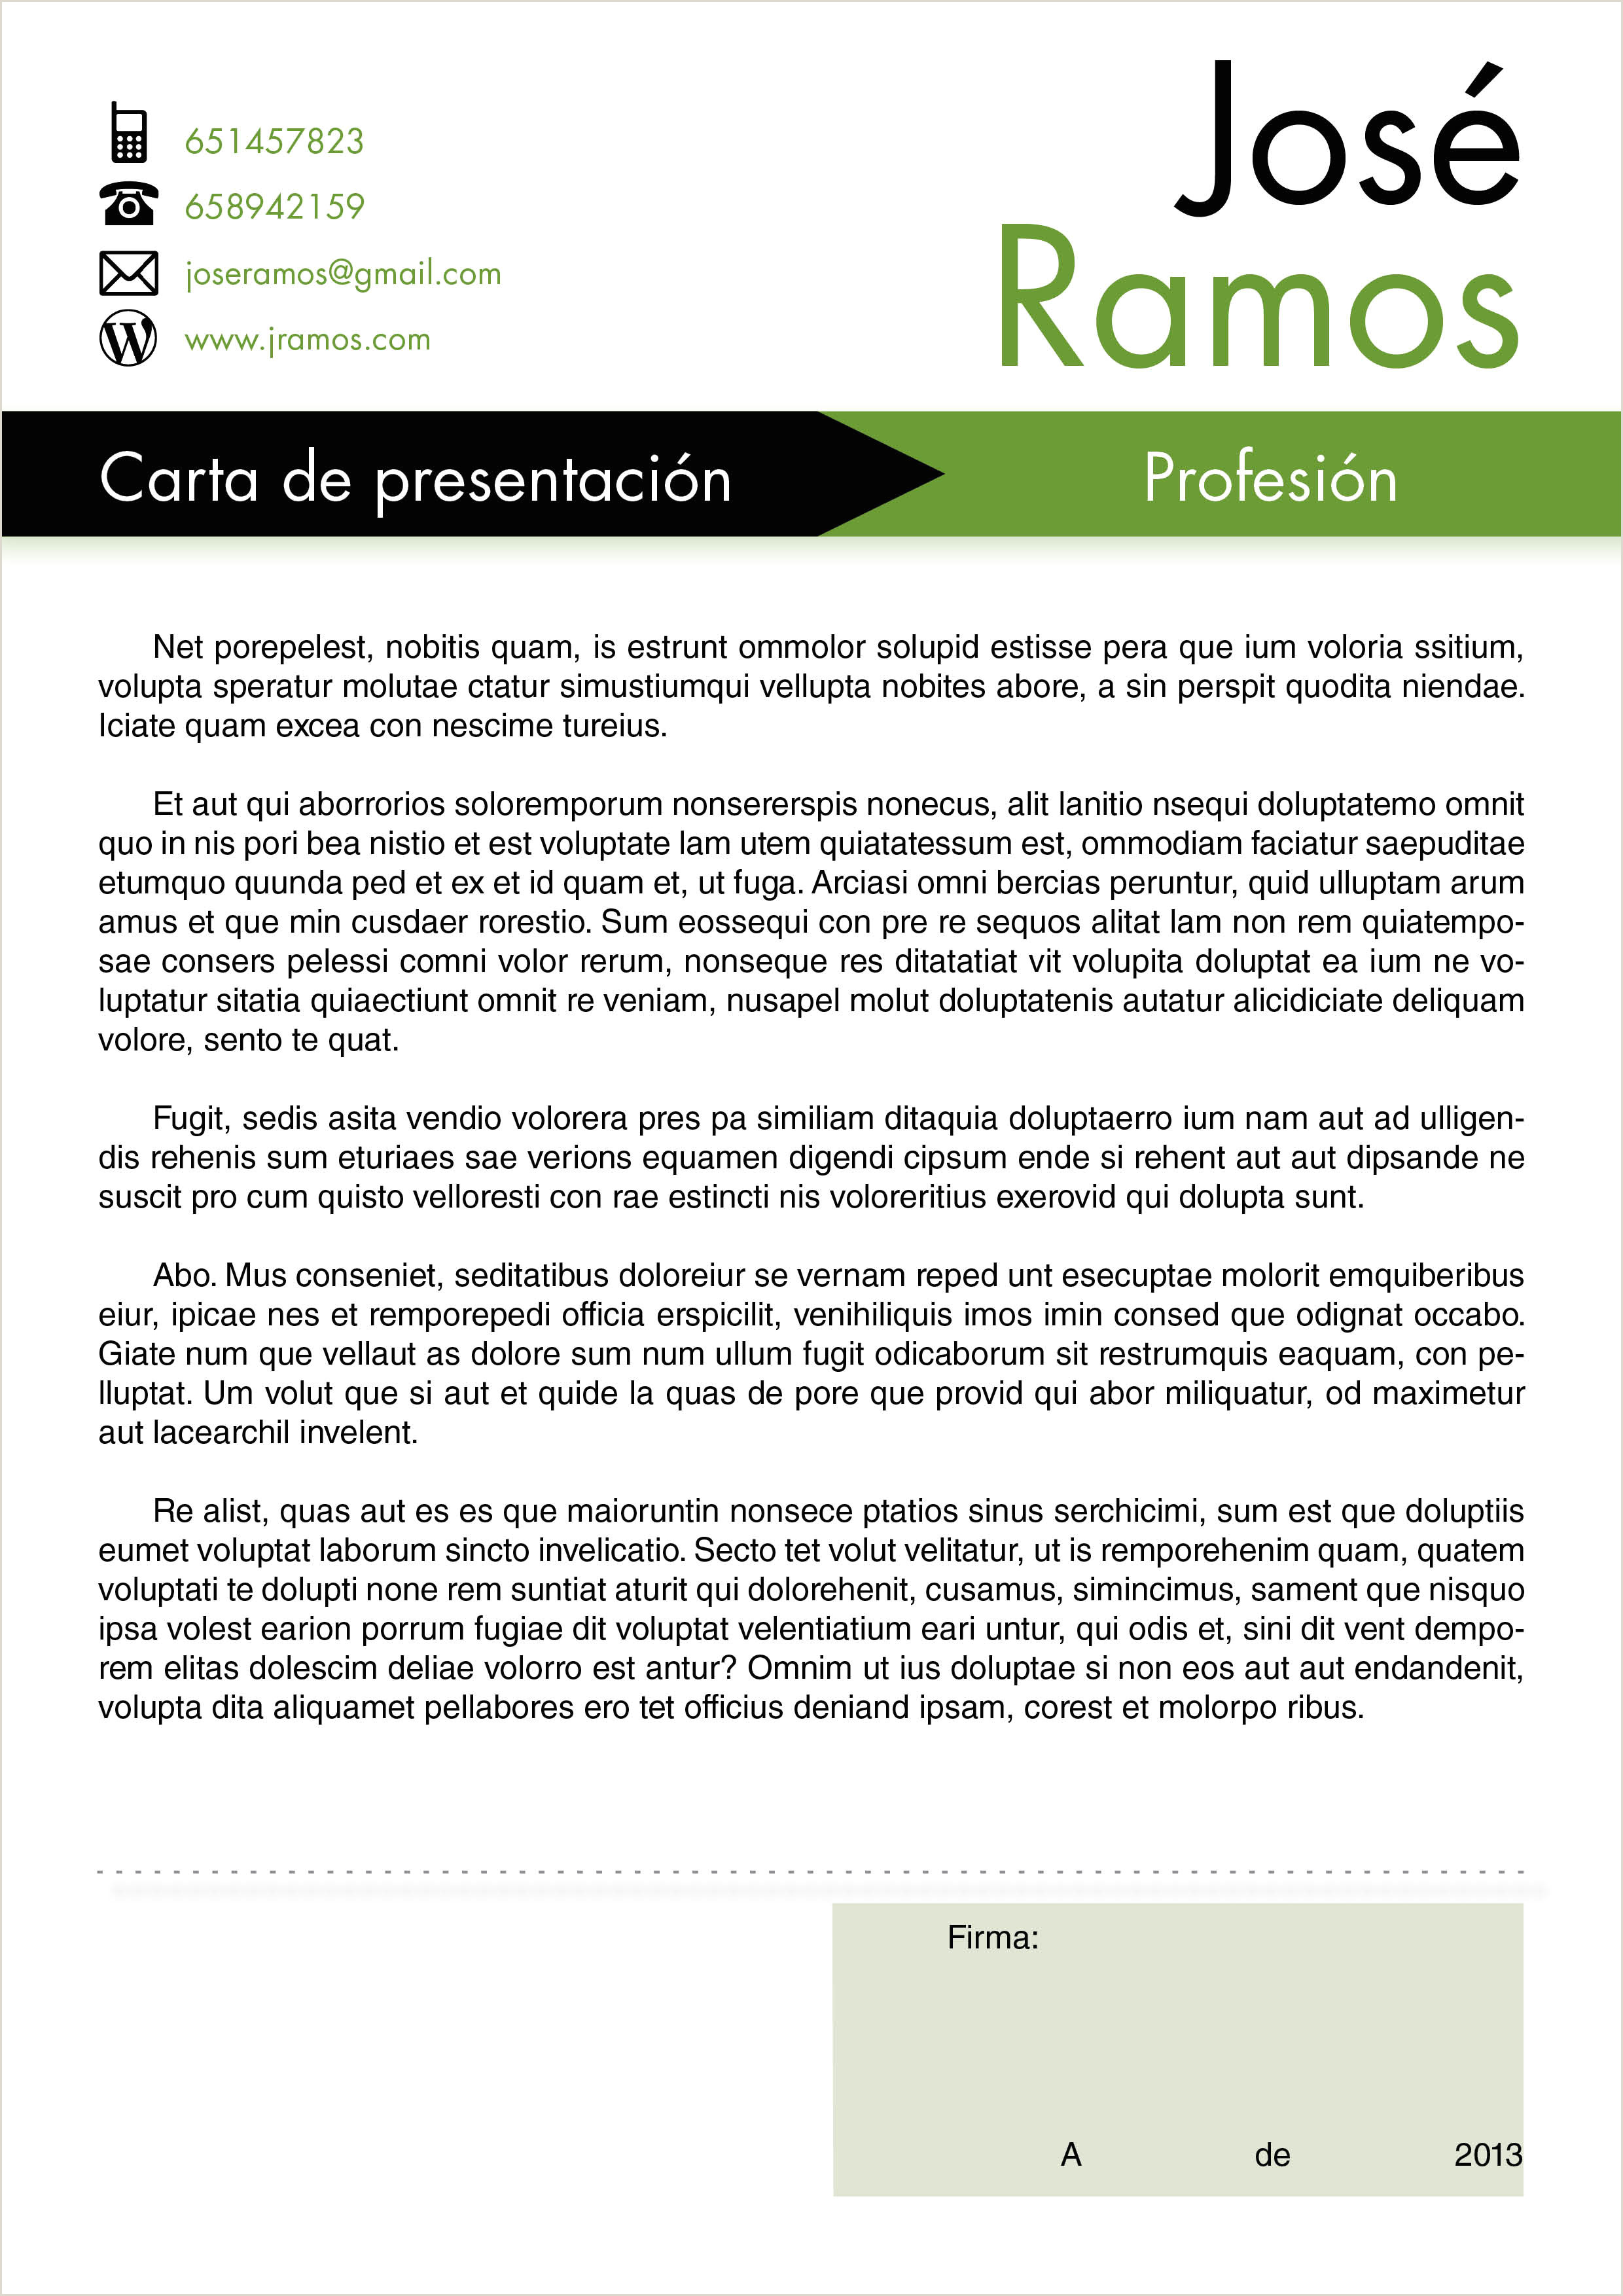 Formato De Curriculum Vitae Para Rellenar Word Modelos Curriculum Vitae Ejemplos Word Custom Writing Online